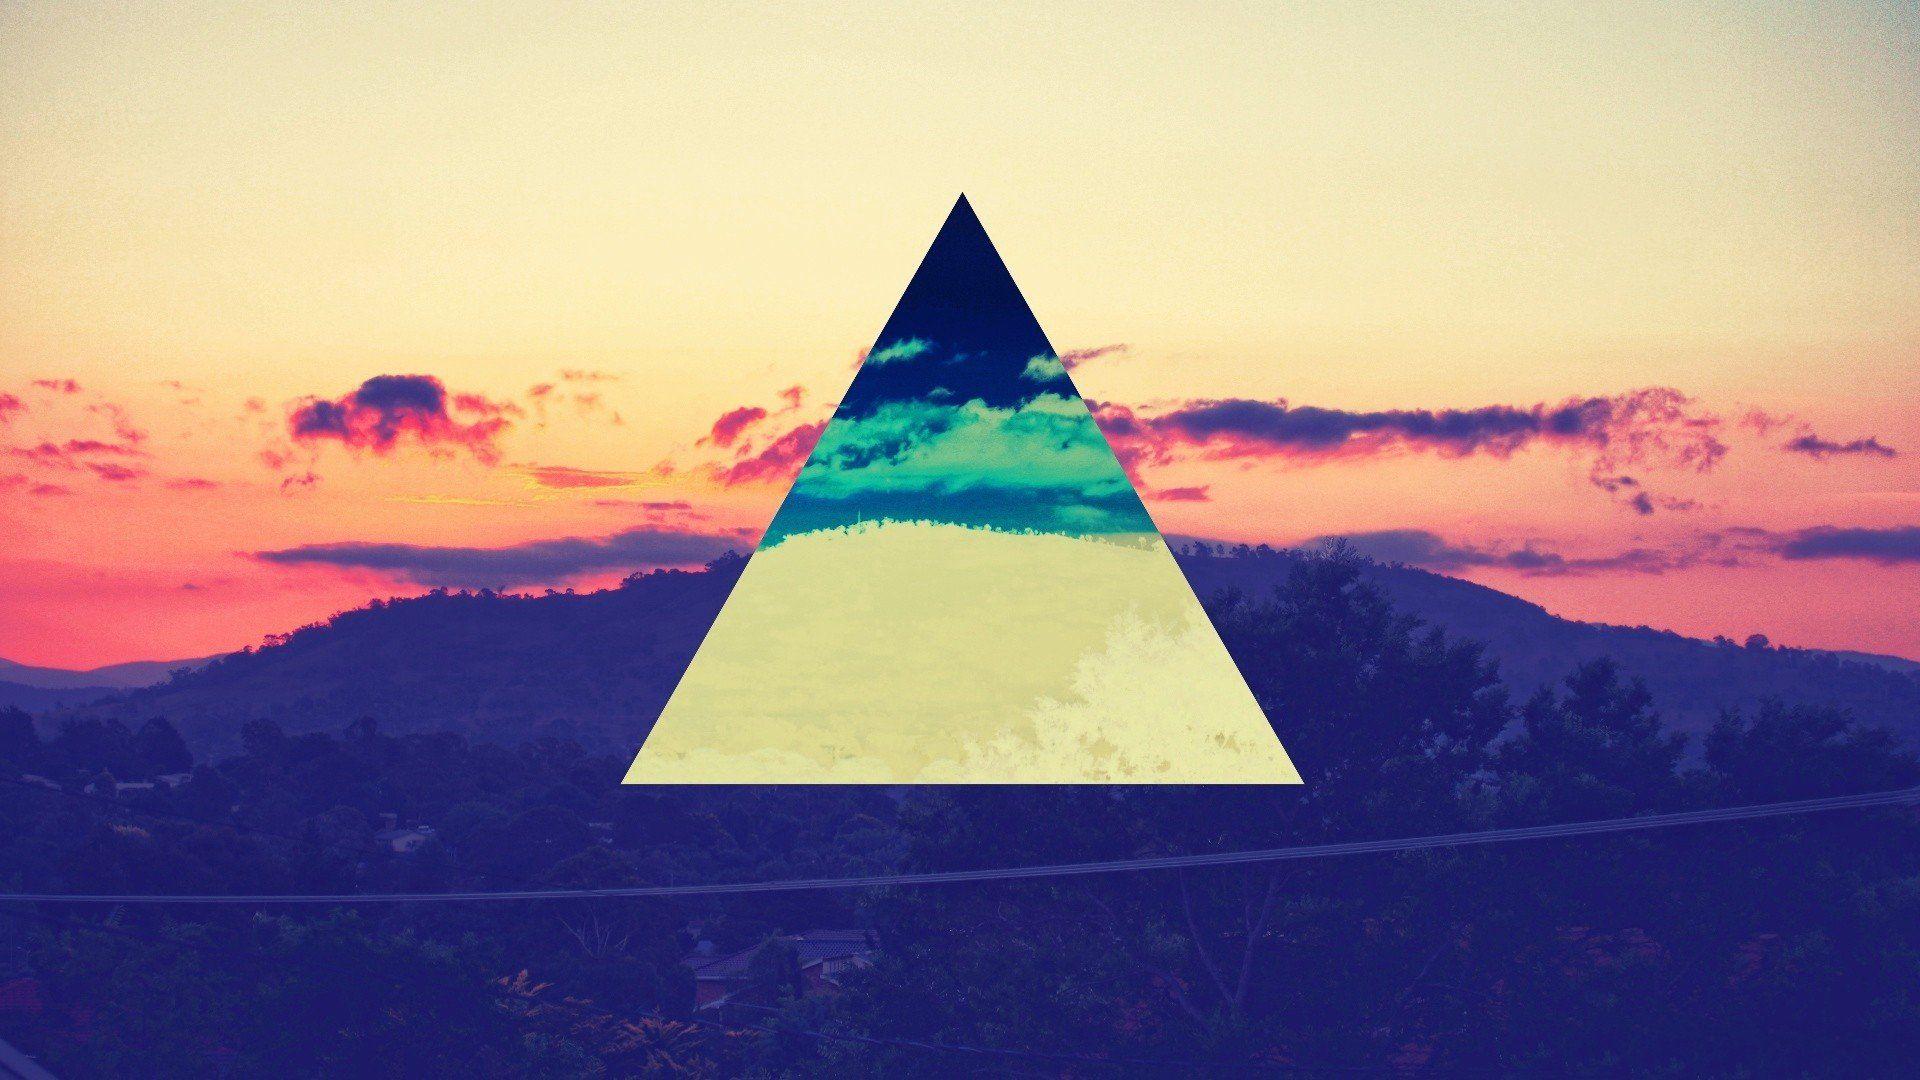 Top Wallpaper Mountain Triangle - 015032cf4b818ac2cb1fc12101adc461  Photograph_597691.jpg